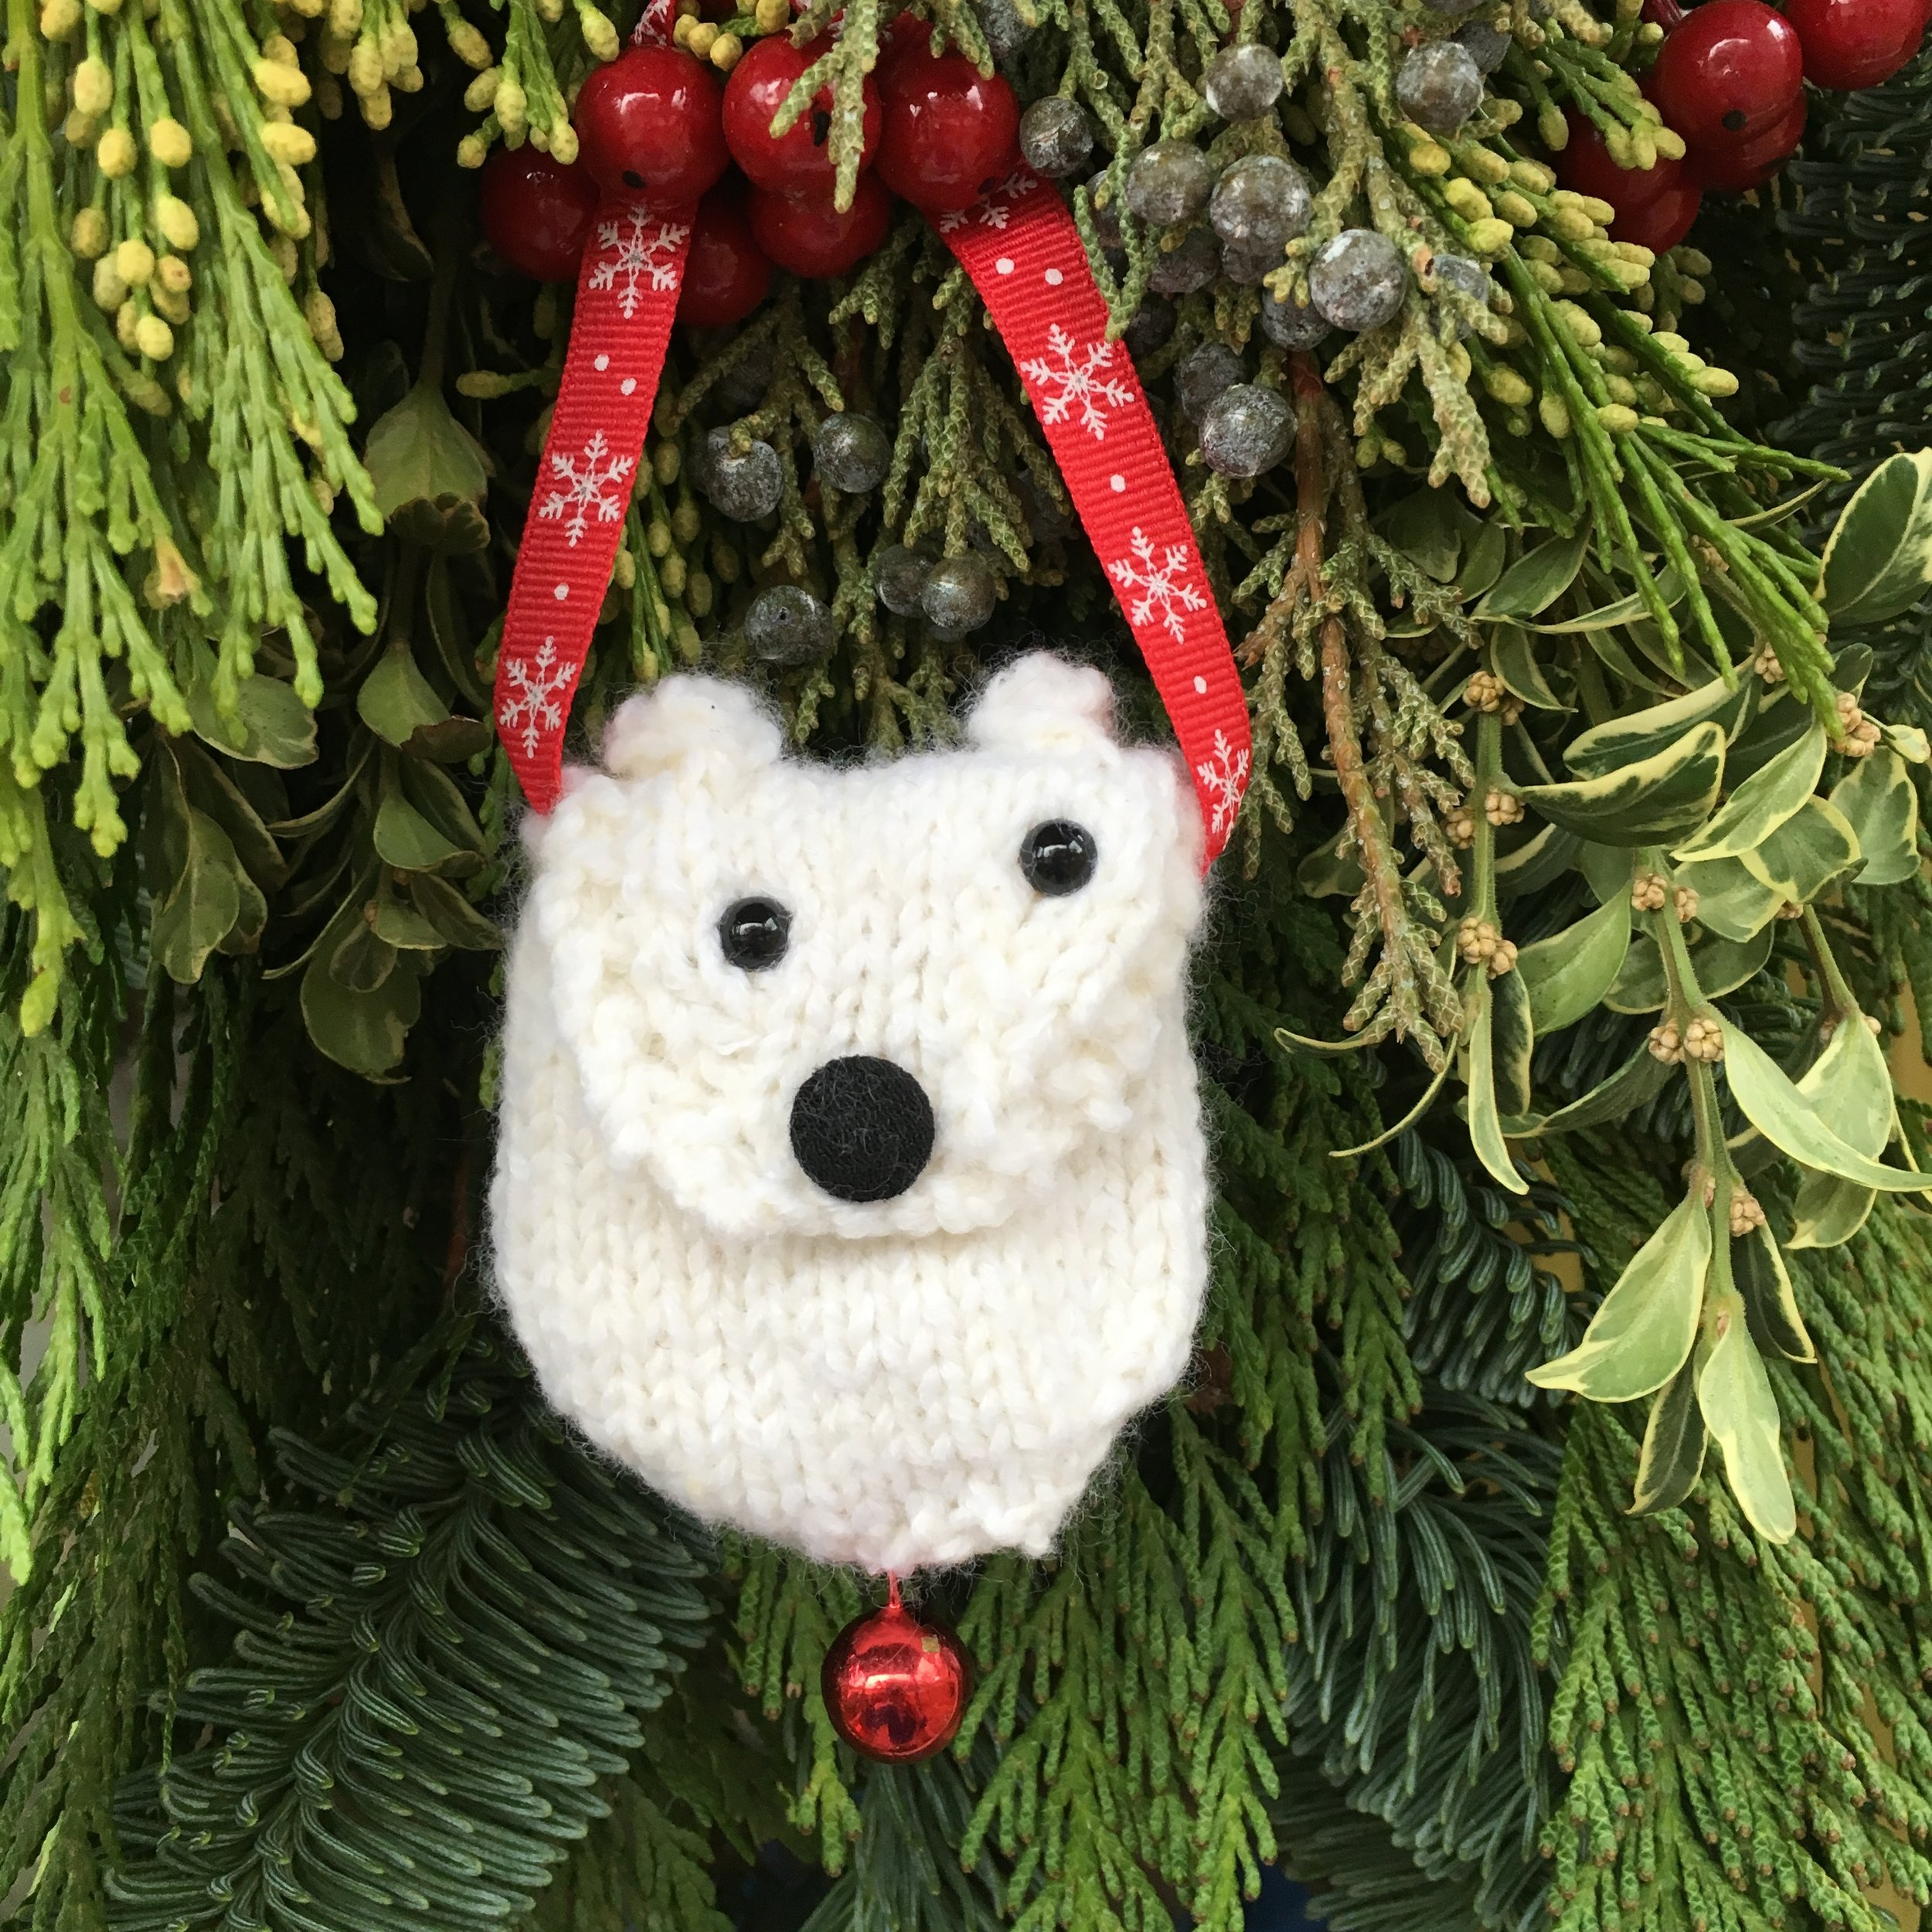 """Polar Bear Pouch"" by Fuzzy Mitten's"